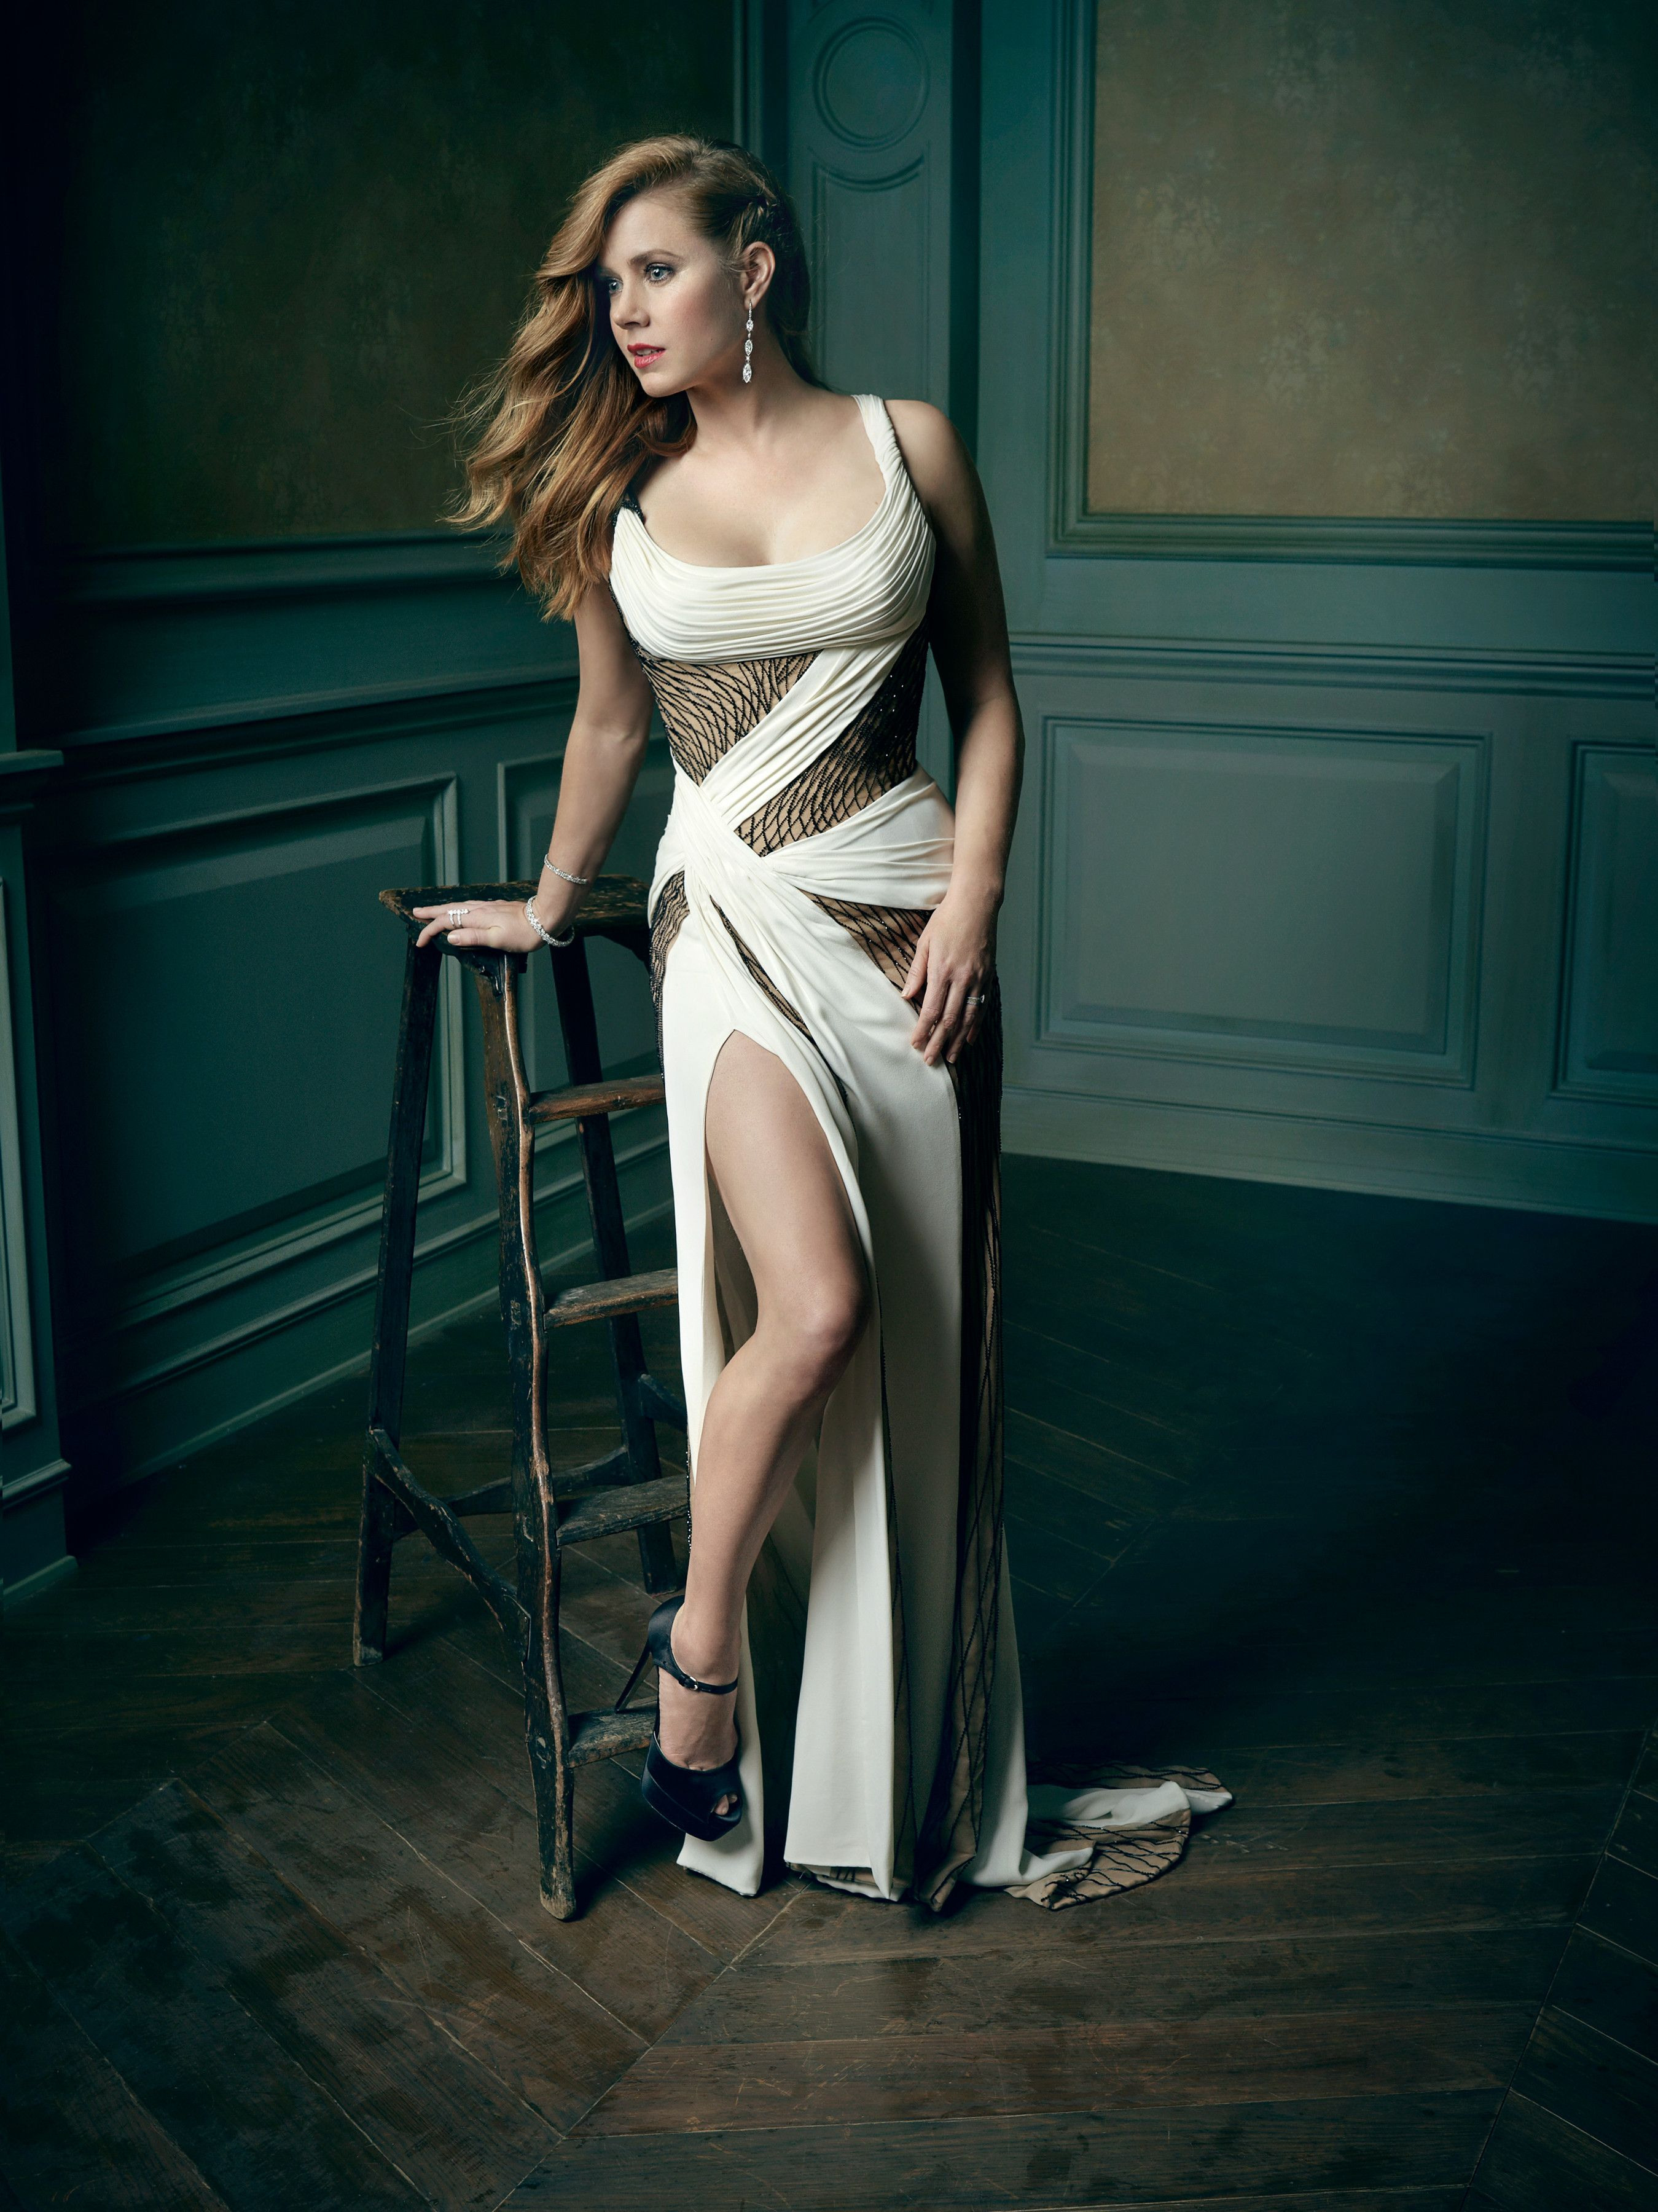 7094f3f0e5ee Amy Adams  gentlemanboners  hot  sexy  photooftheday  model  beautiful  wcw